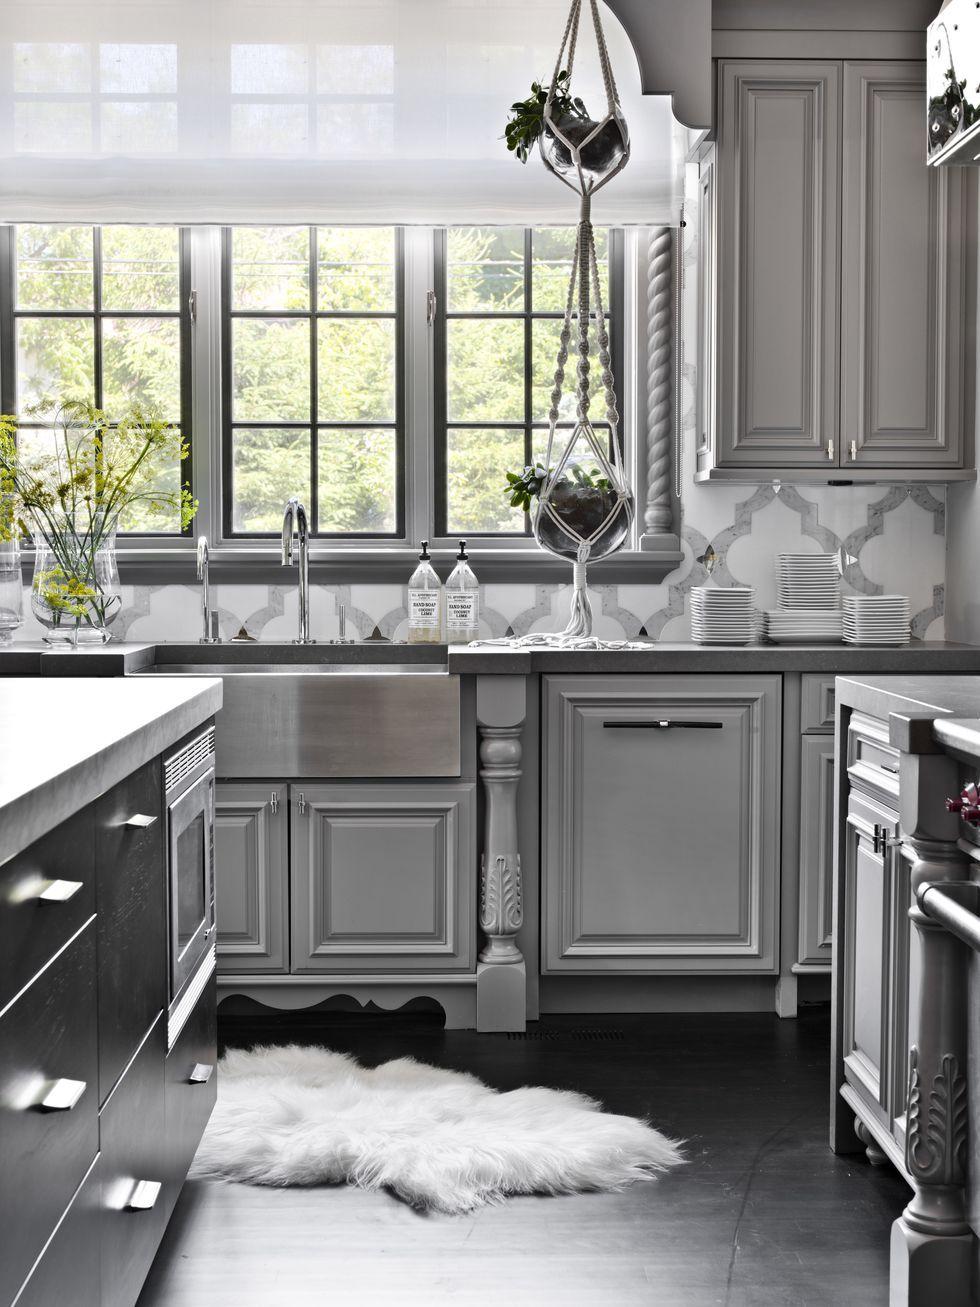 20 gorgeous kitchen tile backsplashes best kitchen tile ideas rh elledecor com kitchen tile backsplash ideas with oak cabinets kitchen tile backsplash ideas with maple cabinets